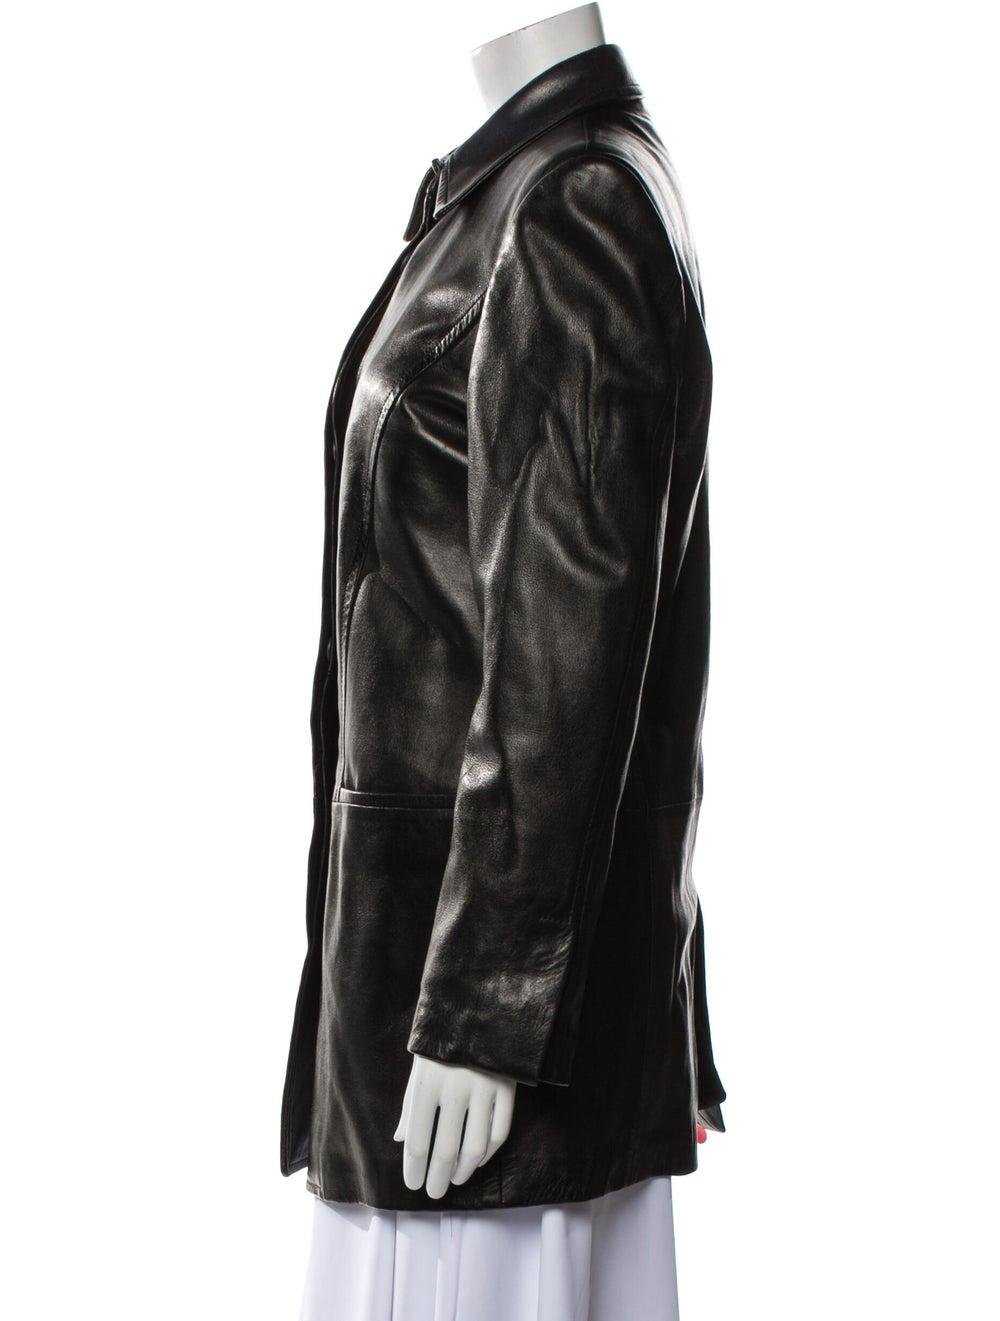 Gucci Vintage 1990's Trench Coat Black - image 2